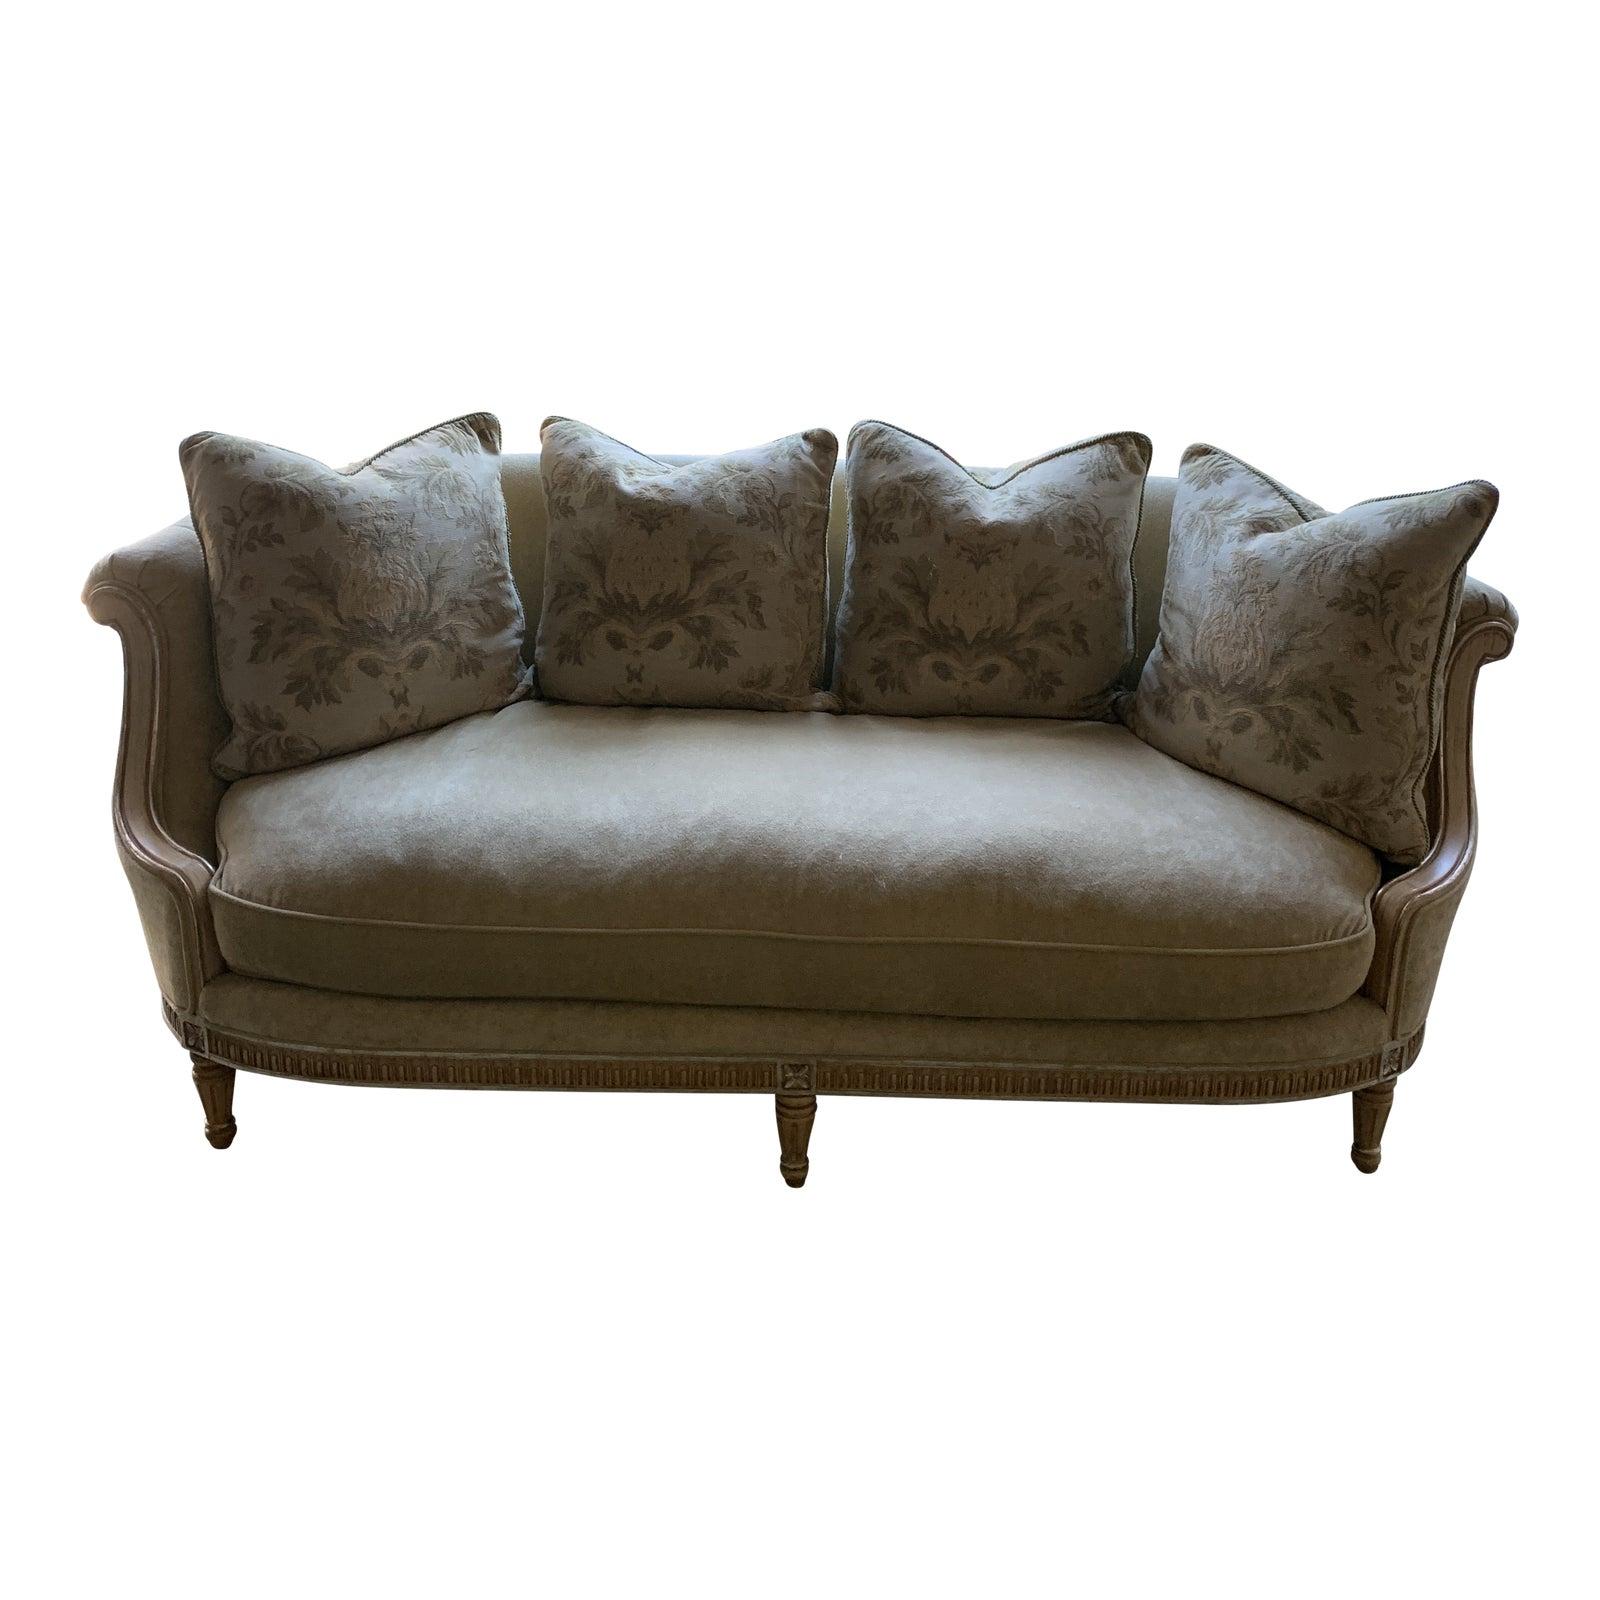 French Style Oversized Sofa | Chairish